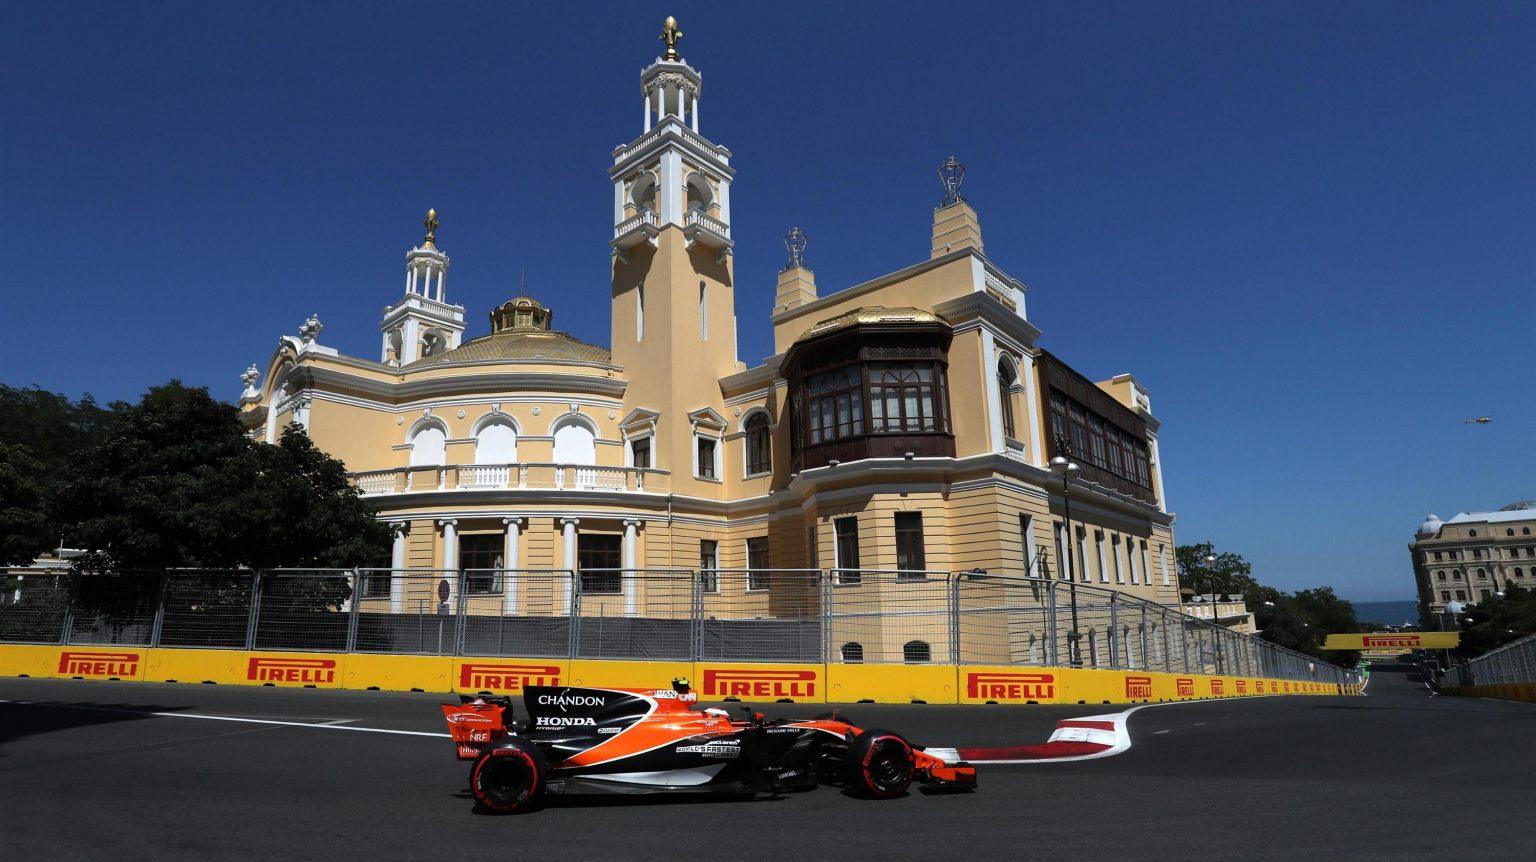 McLaren Honda Baku Struggle Vandoorne.jpg